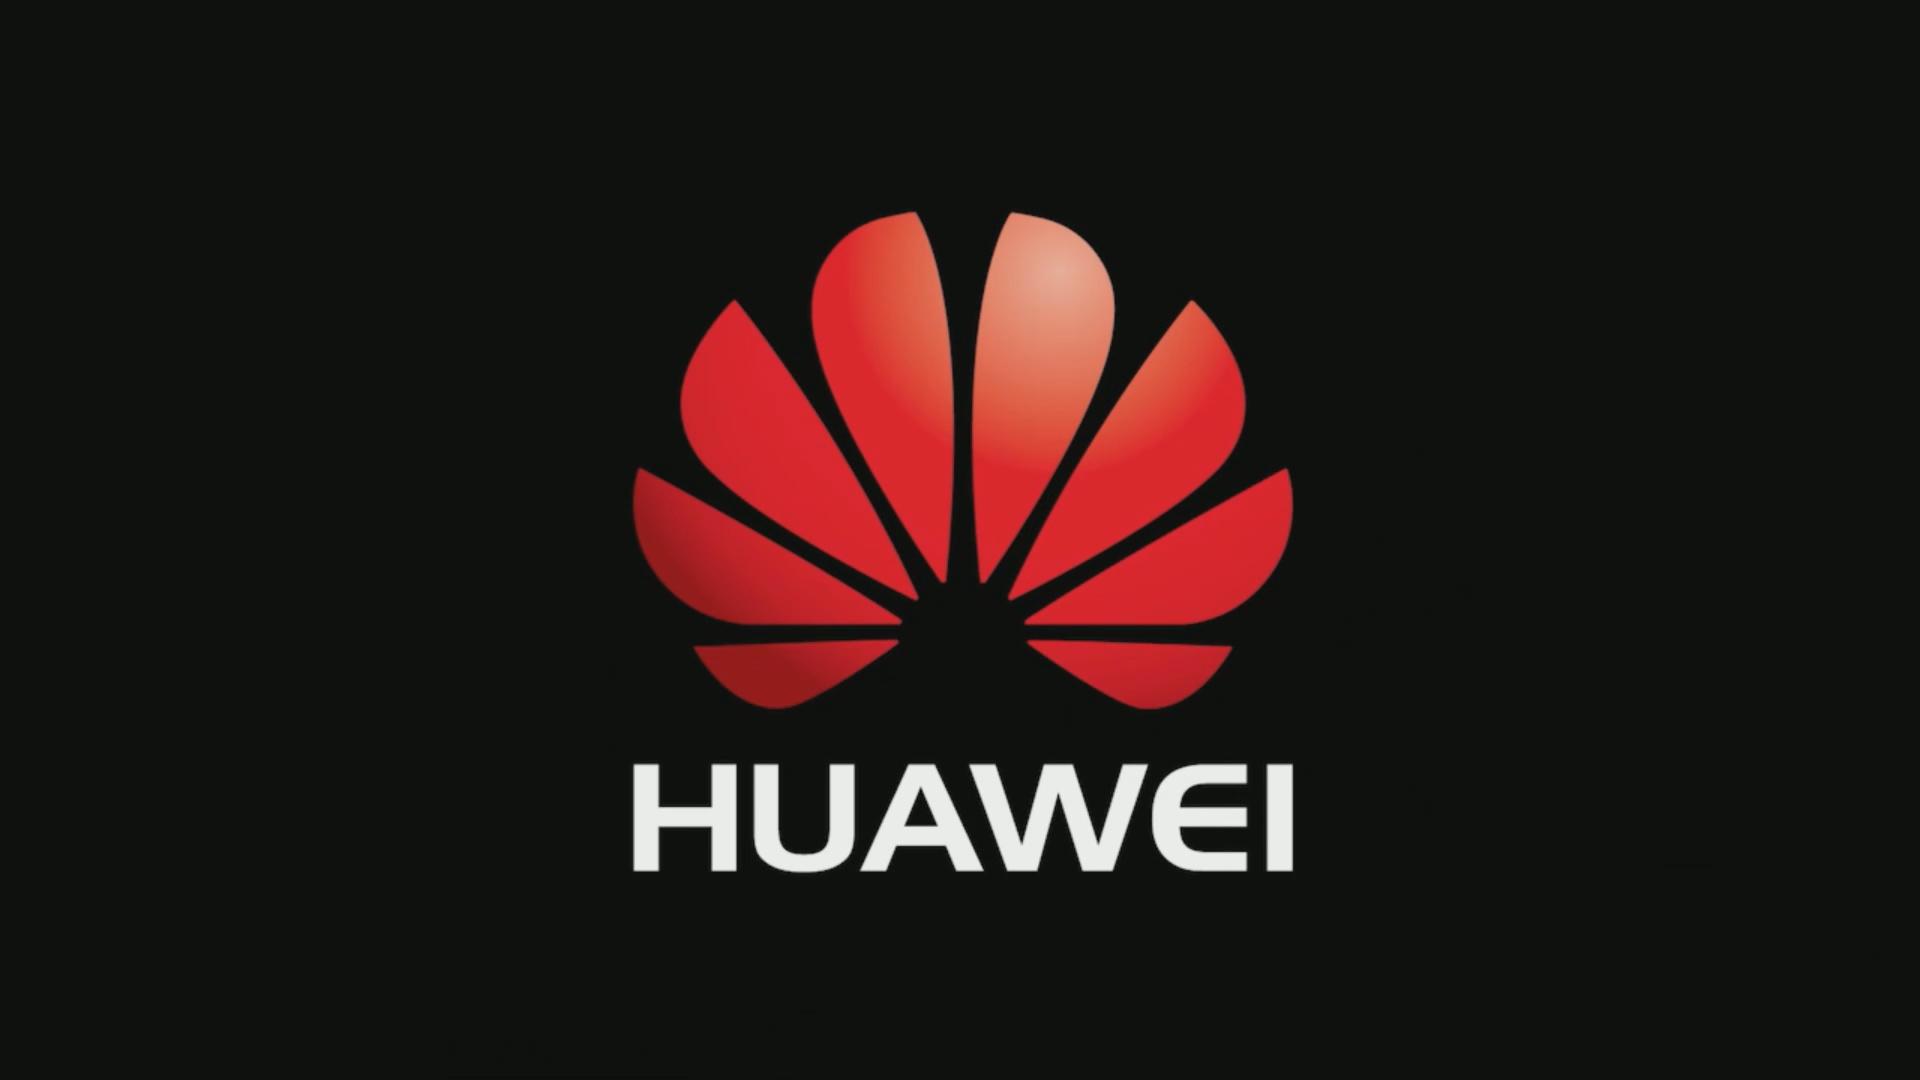 Fixed - Sound Not Works on Huawei U8520 Duplex